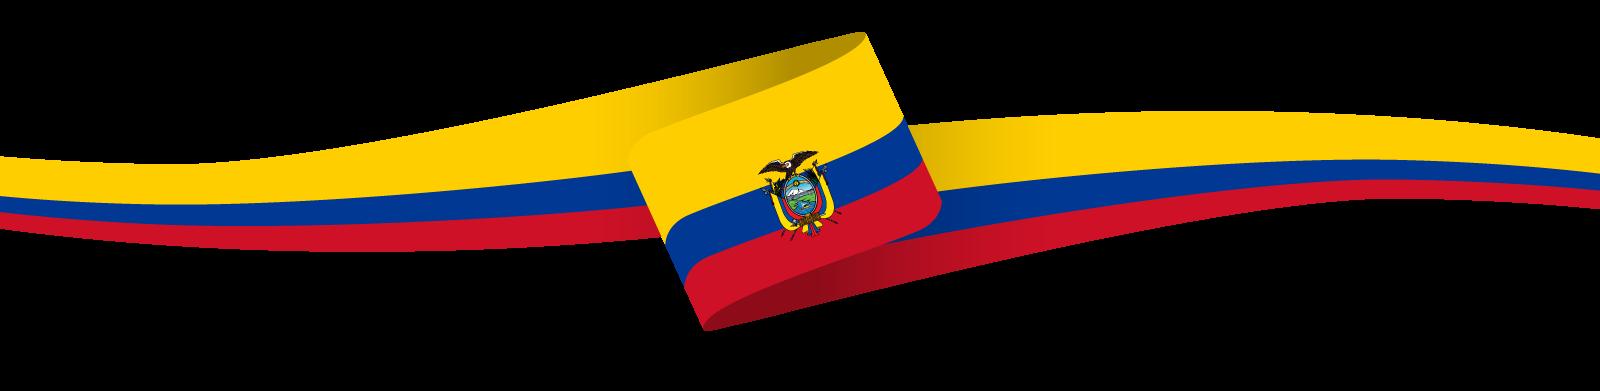 Bandera De Ecuador Png images collection for free download.